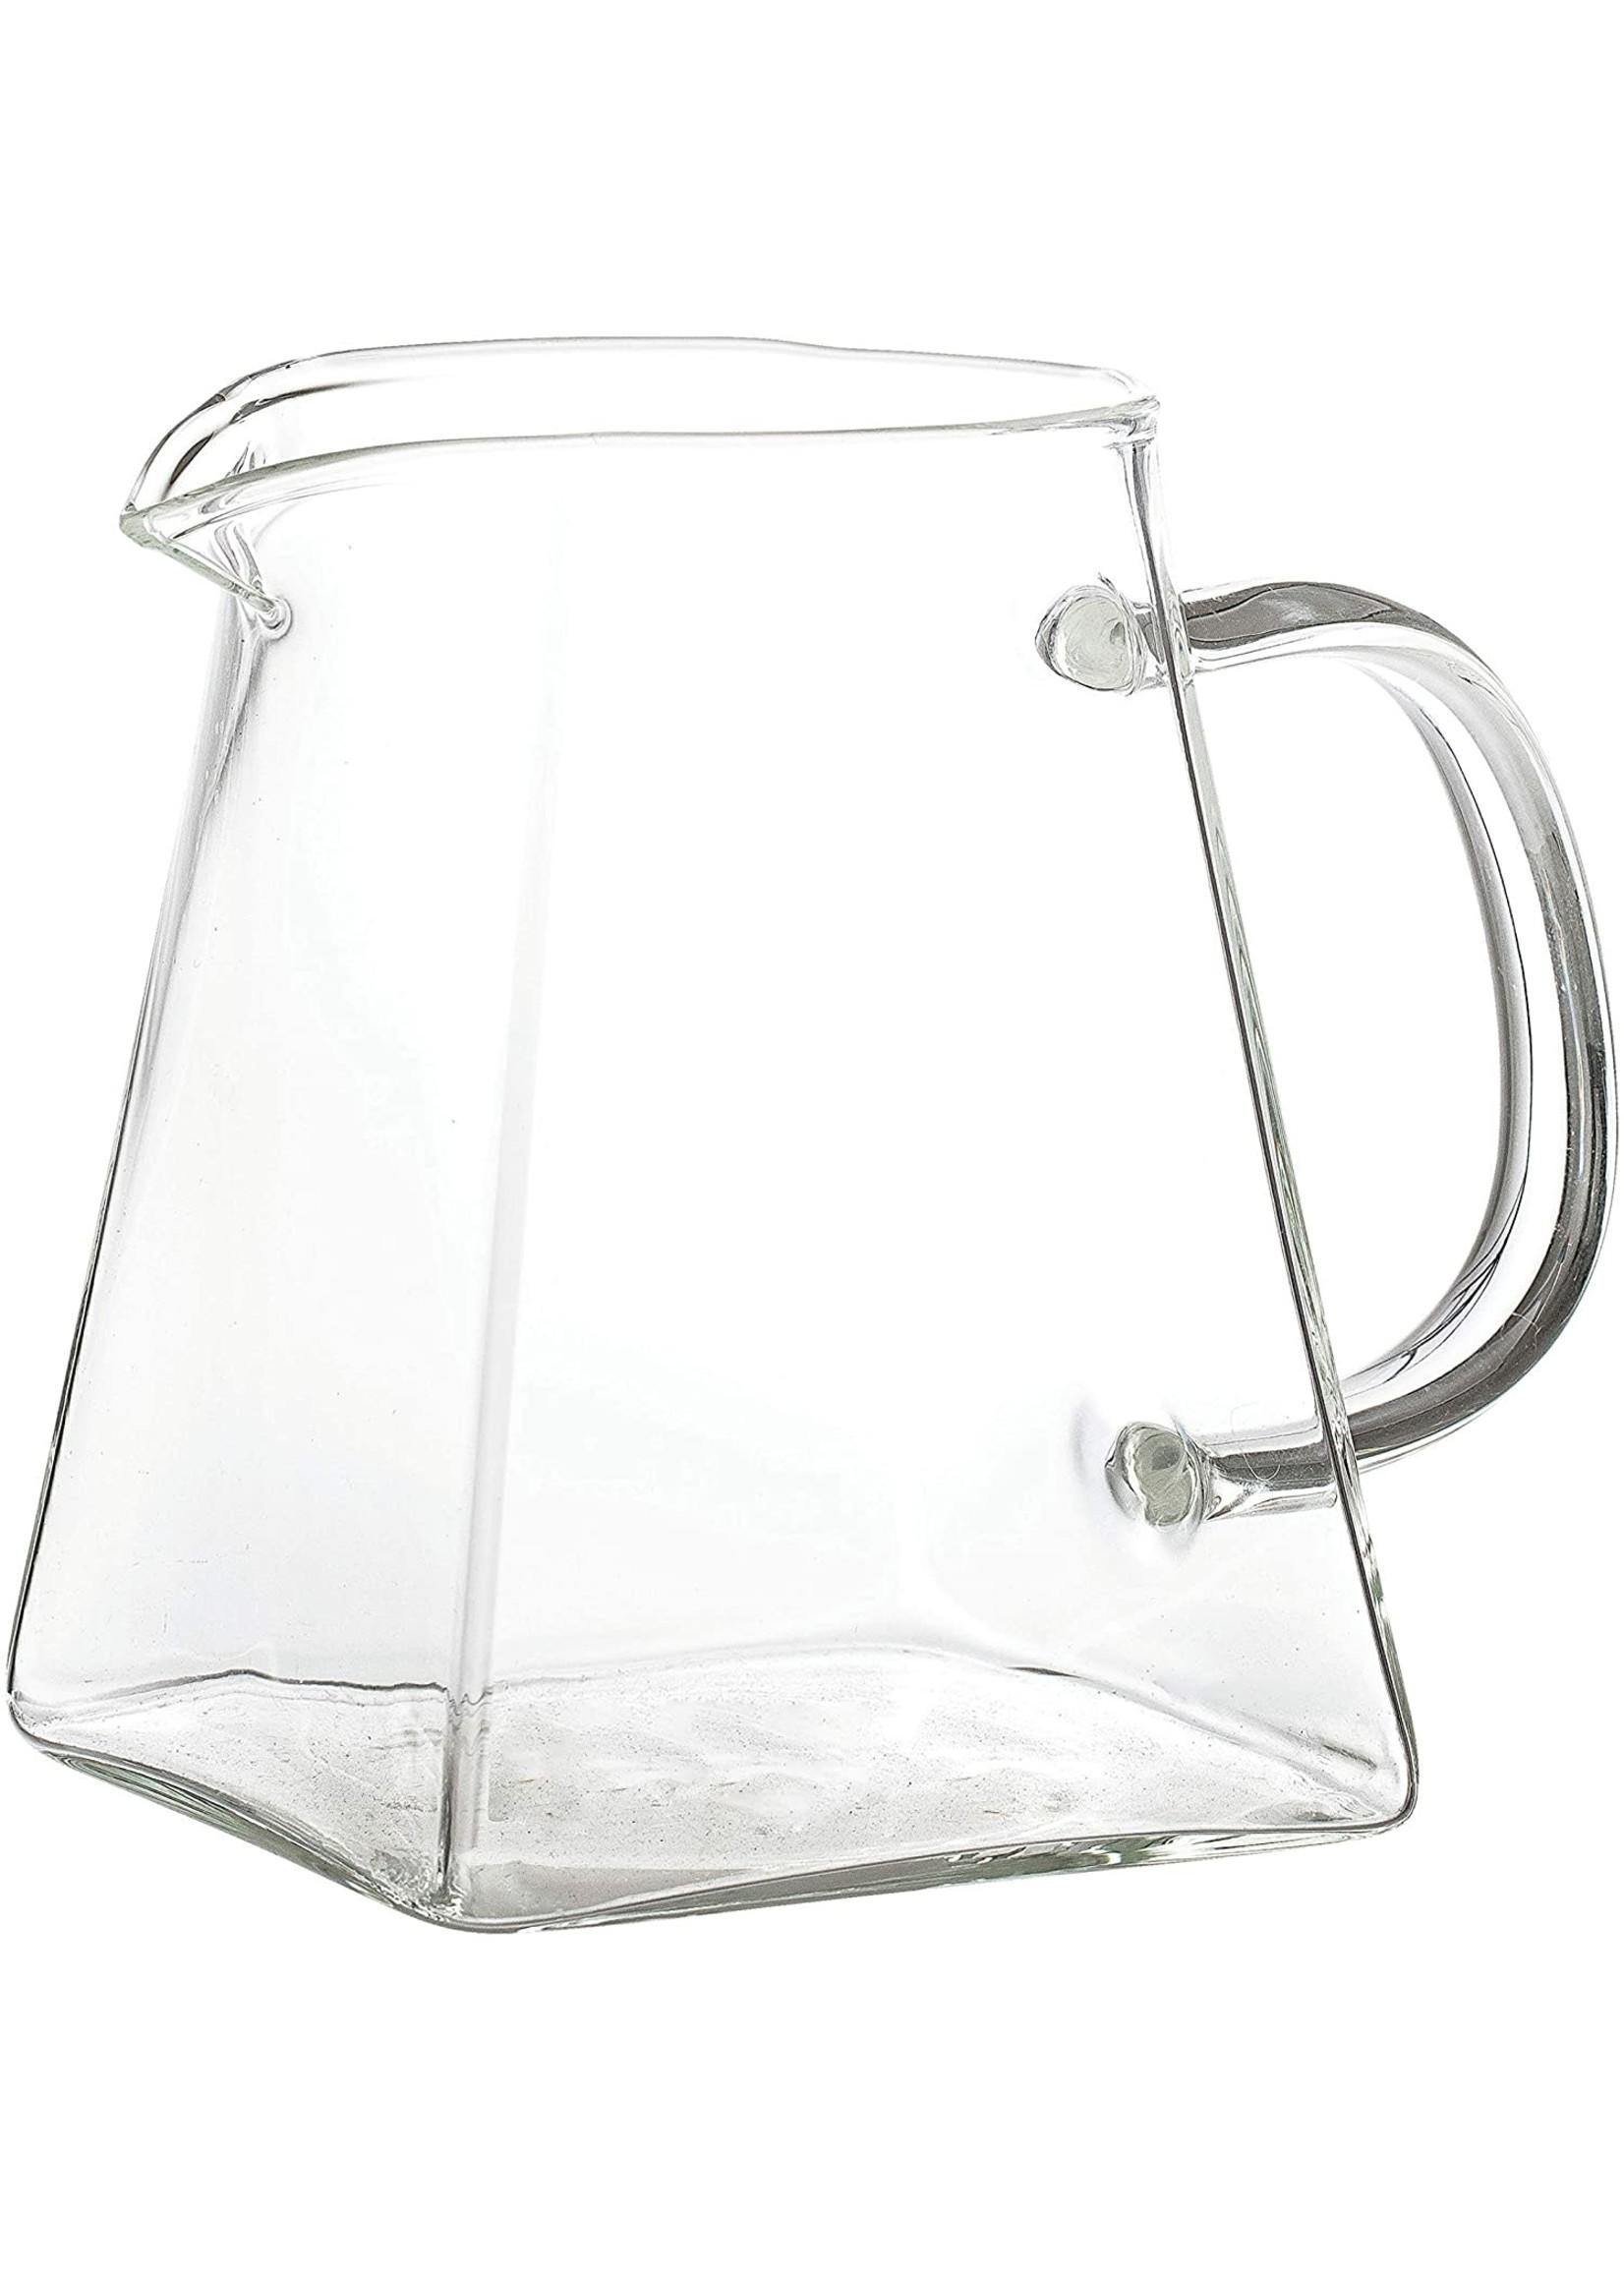 GLASS PITCHER W/ SQUARE BASE